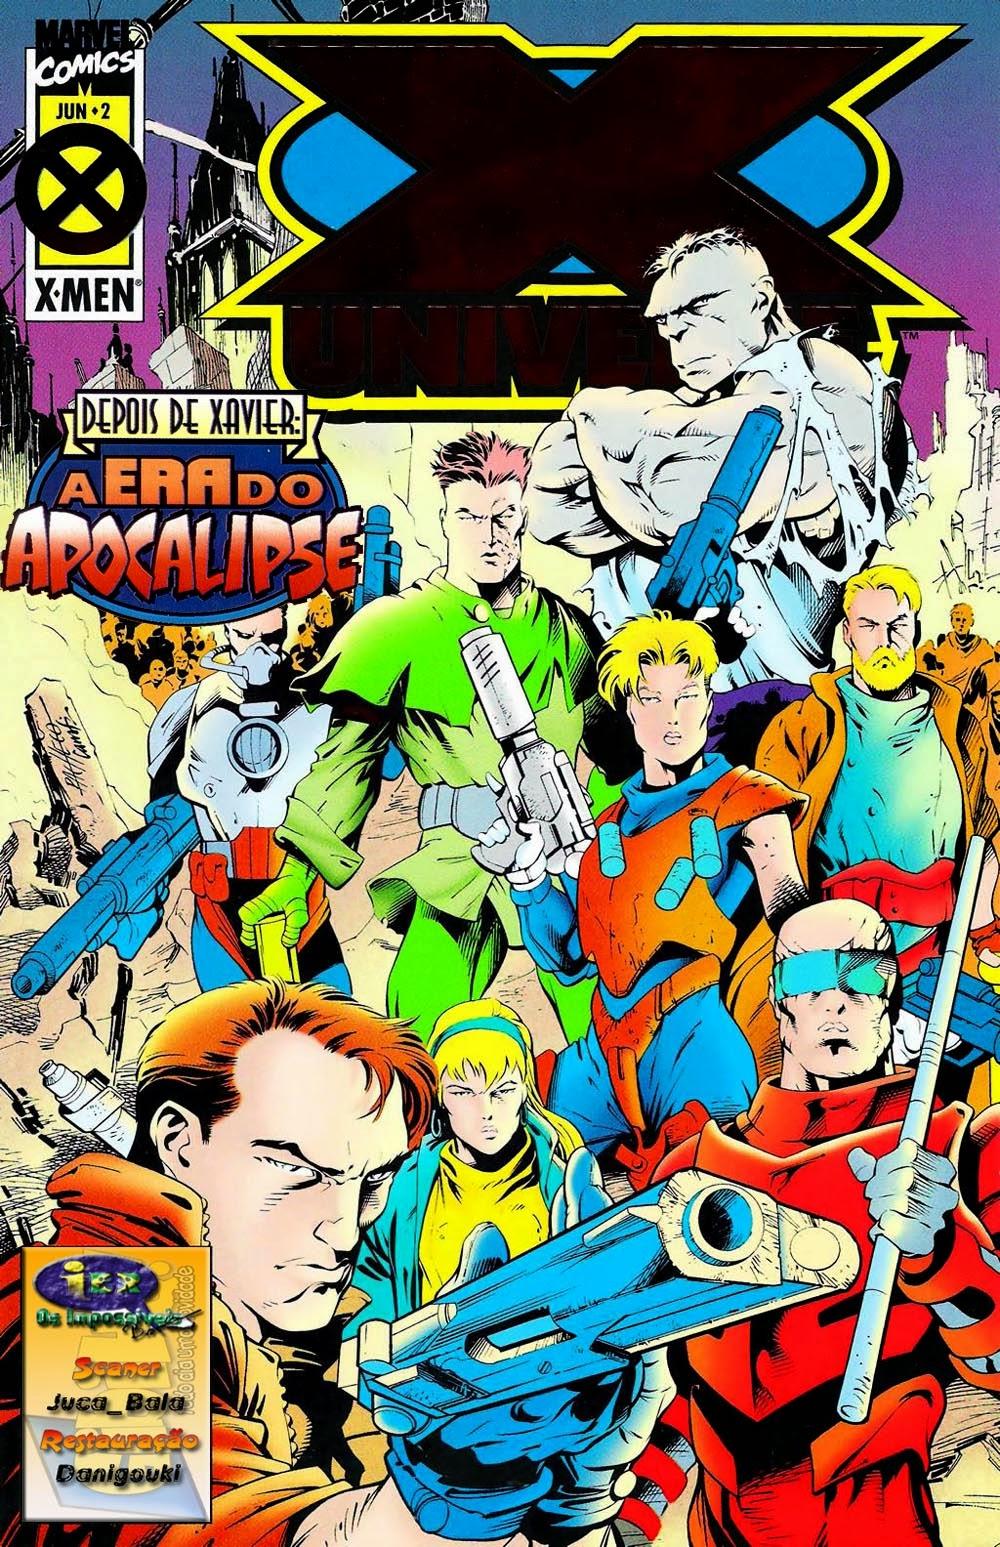 X-Men - A Era do Apocalipse #47